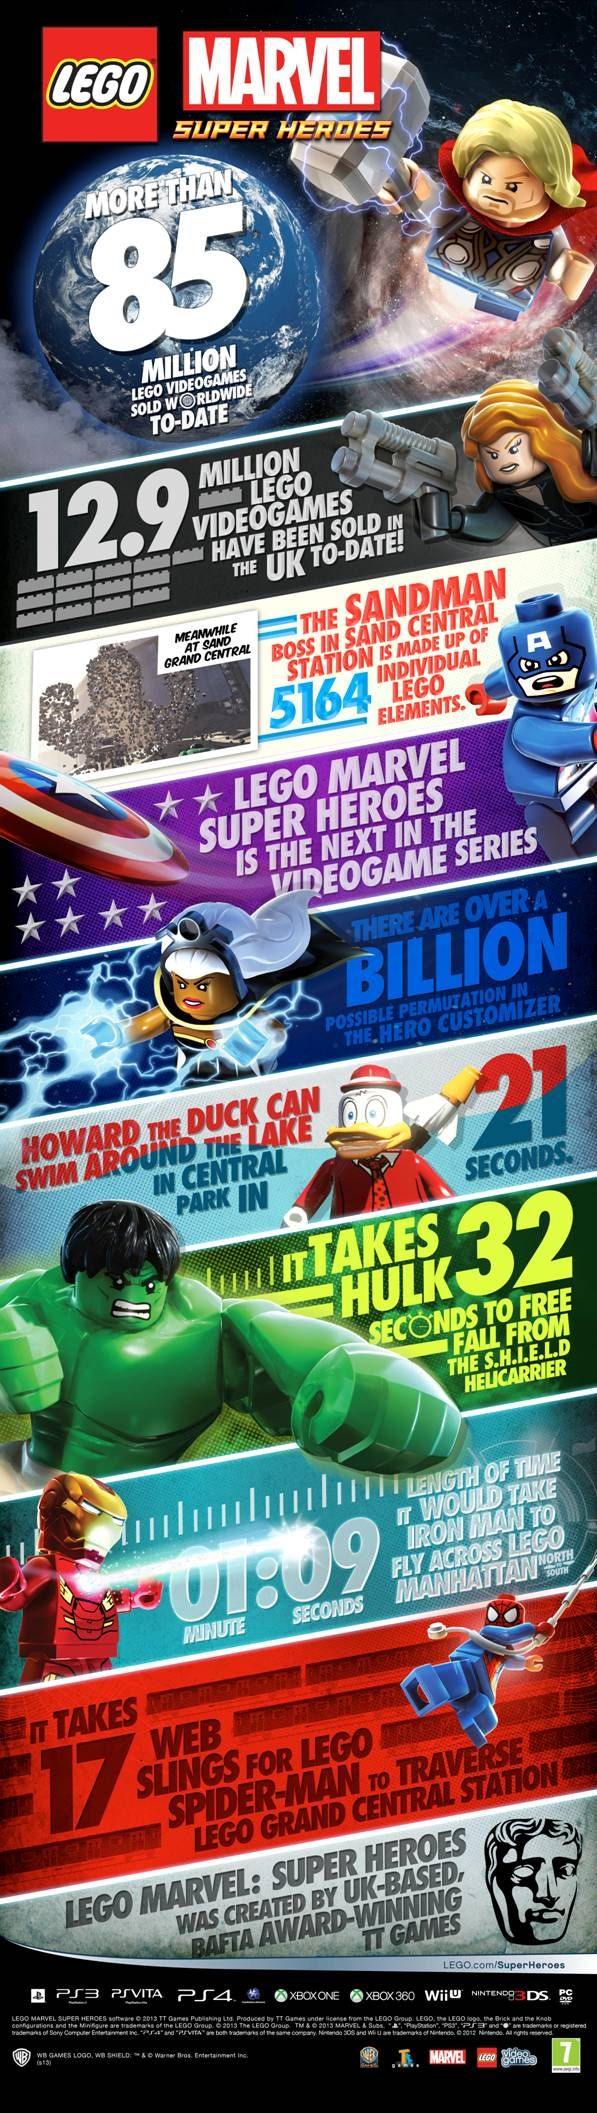 Lego Marvel Superheroes Infographic